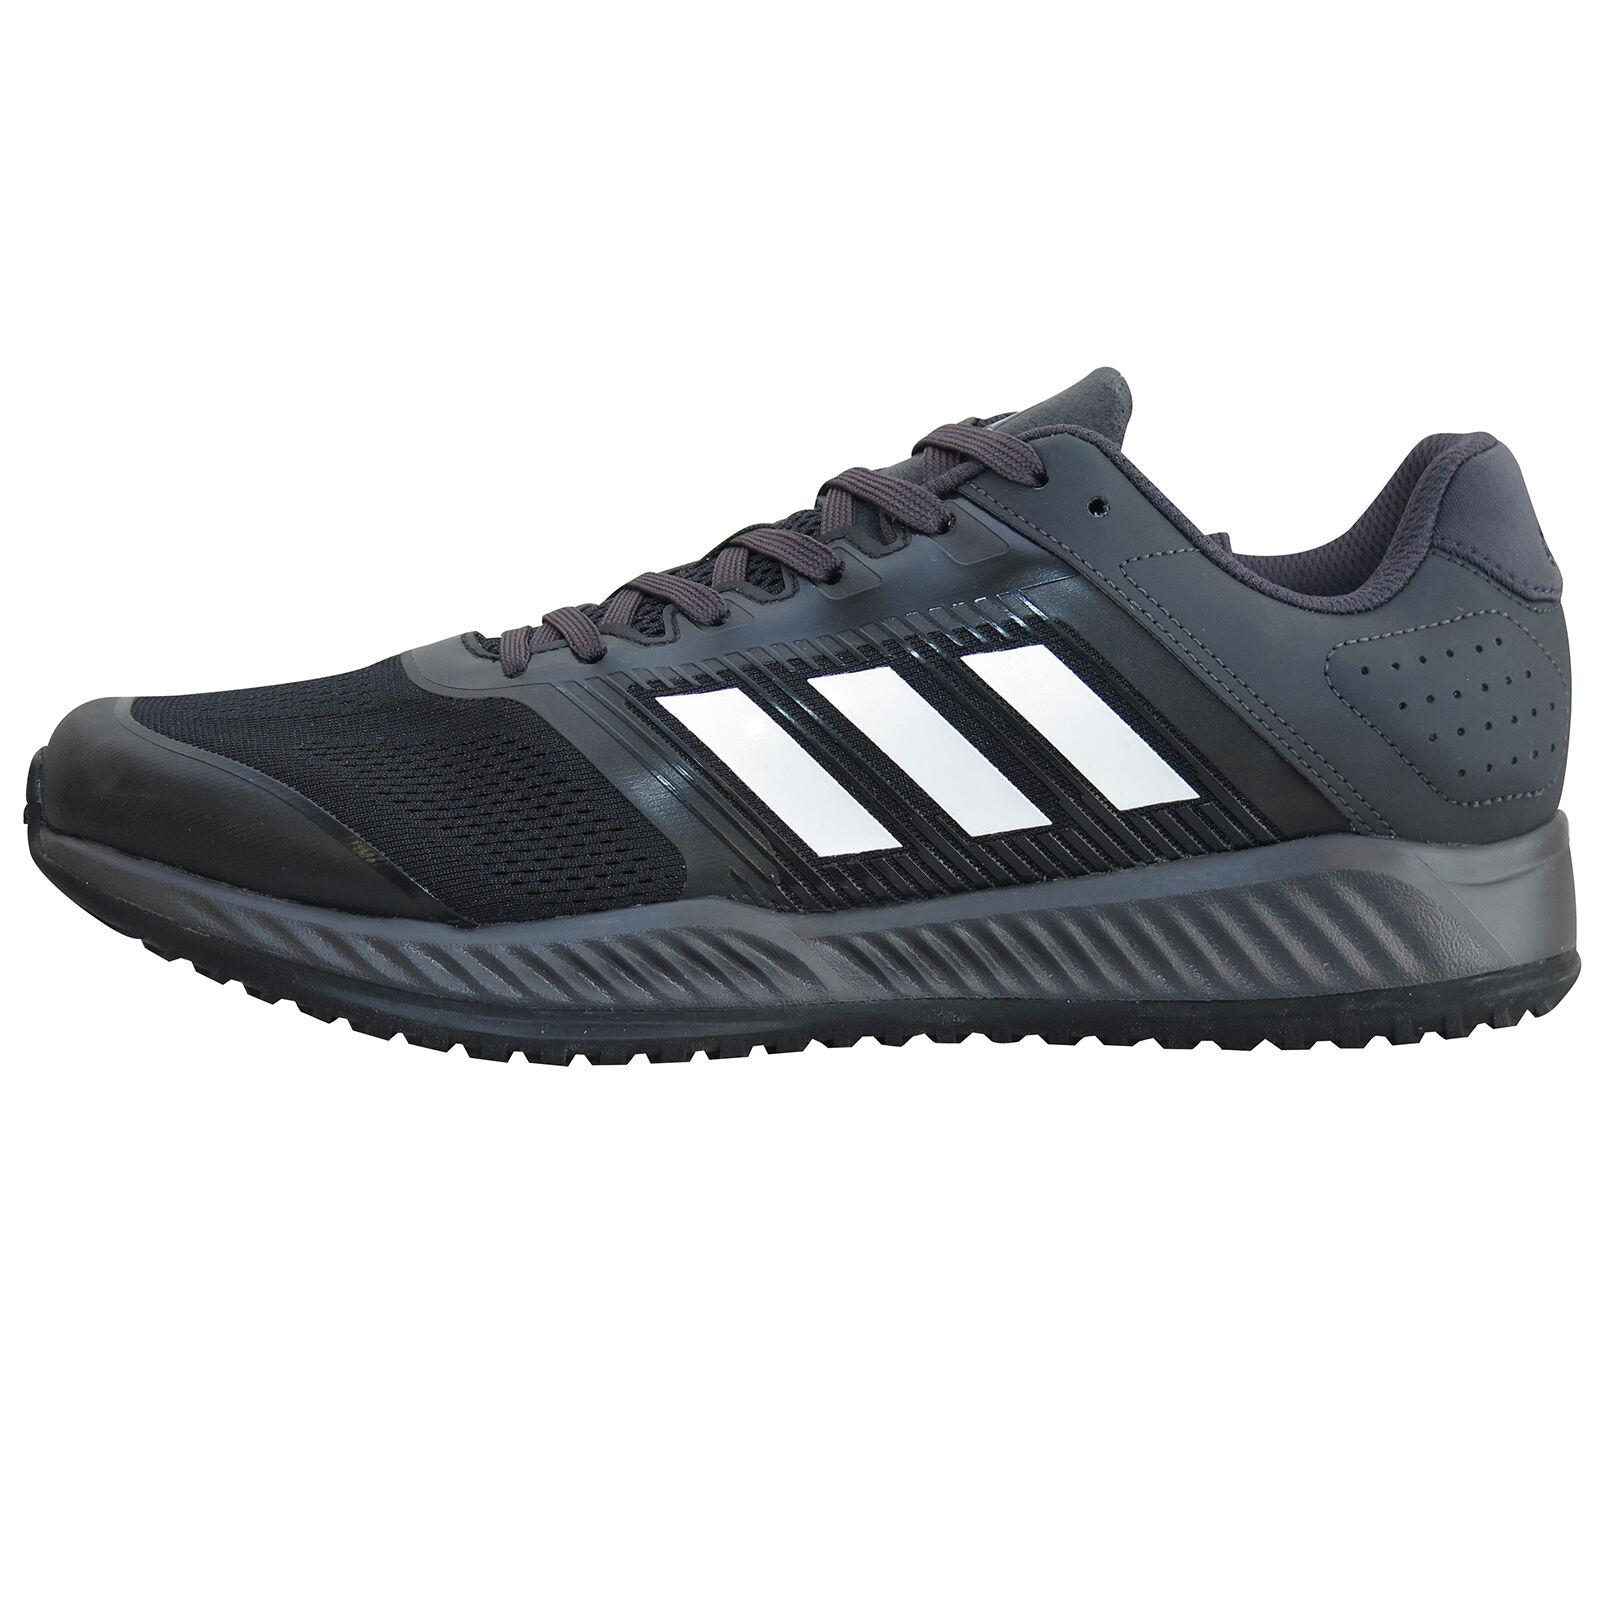 Adidas Zg bounce M Men's Training Shoes